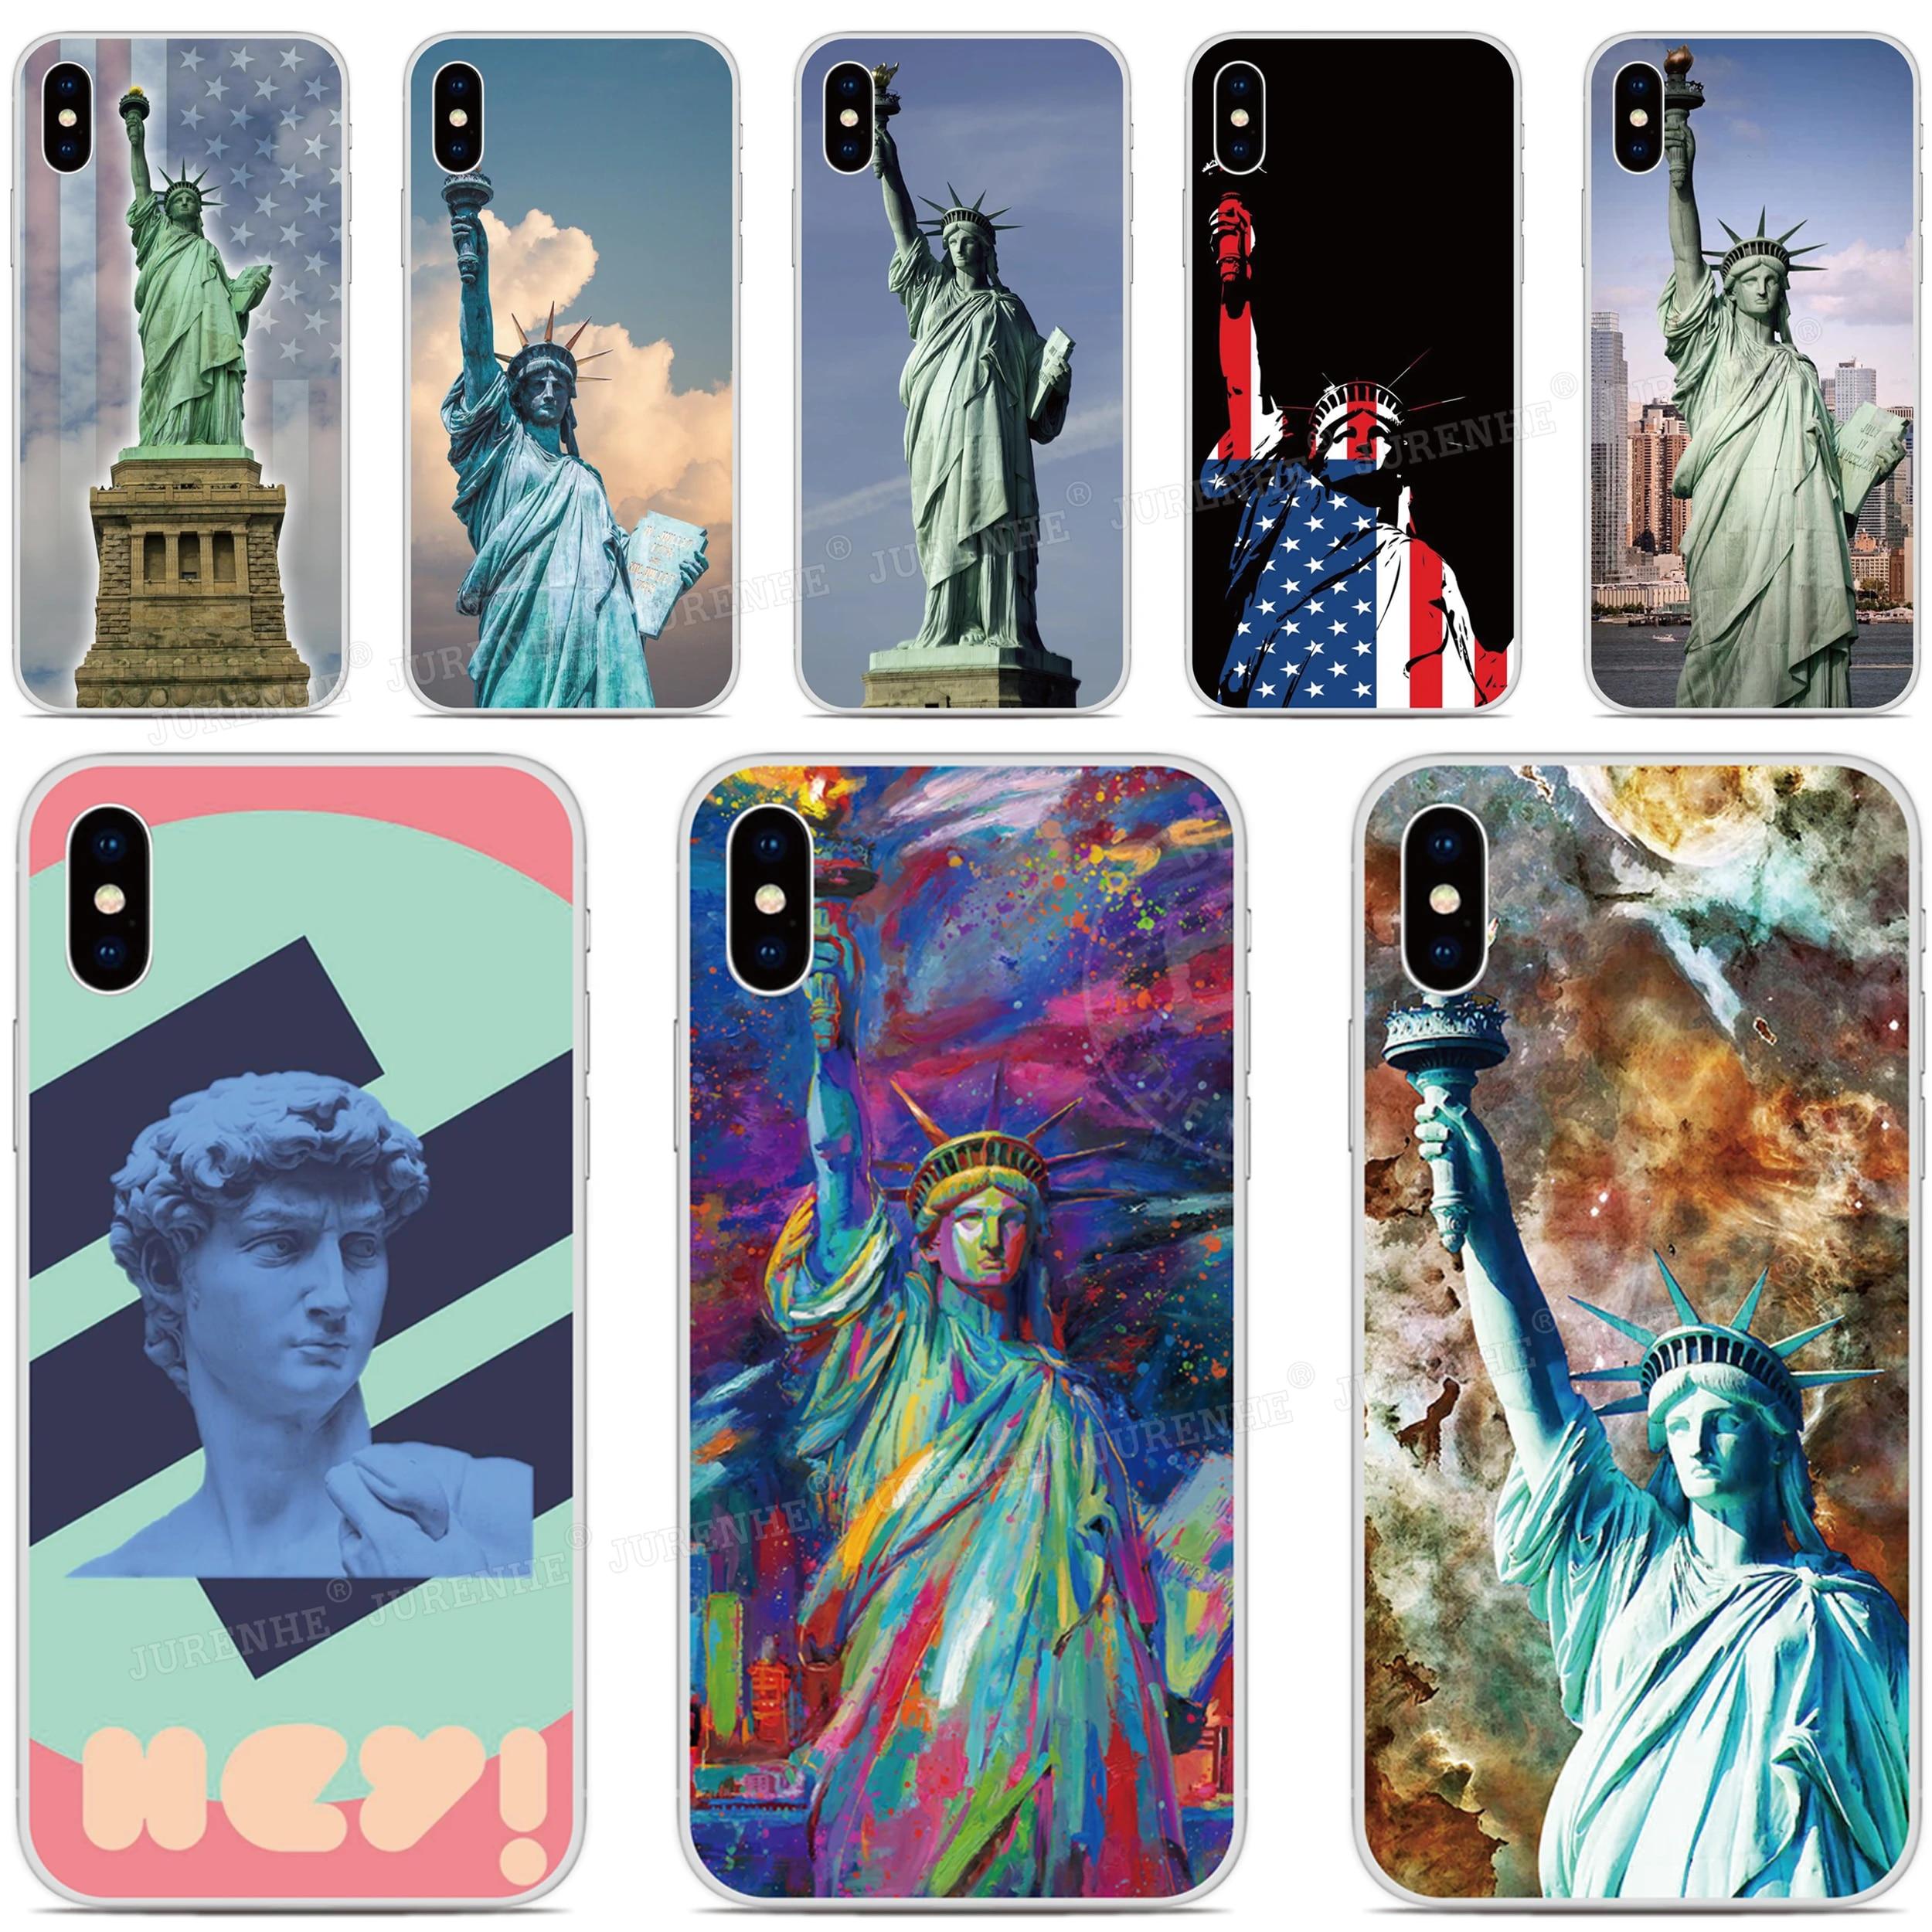 Statue Liberty Medusa Soft TPU Phone Case For Cubot P30 X19 R11 J3 Pro P20  Power Nova Note S J5 J7 R15 Pro R19 Max 2 2019 Cover|Phone Case & Covers| -  AliExpress